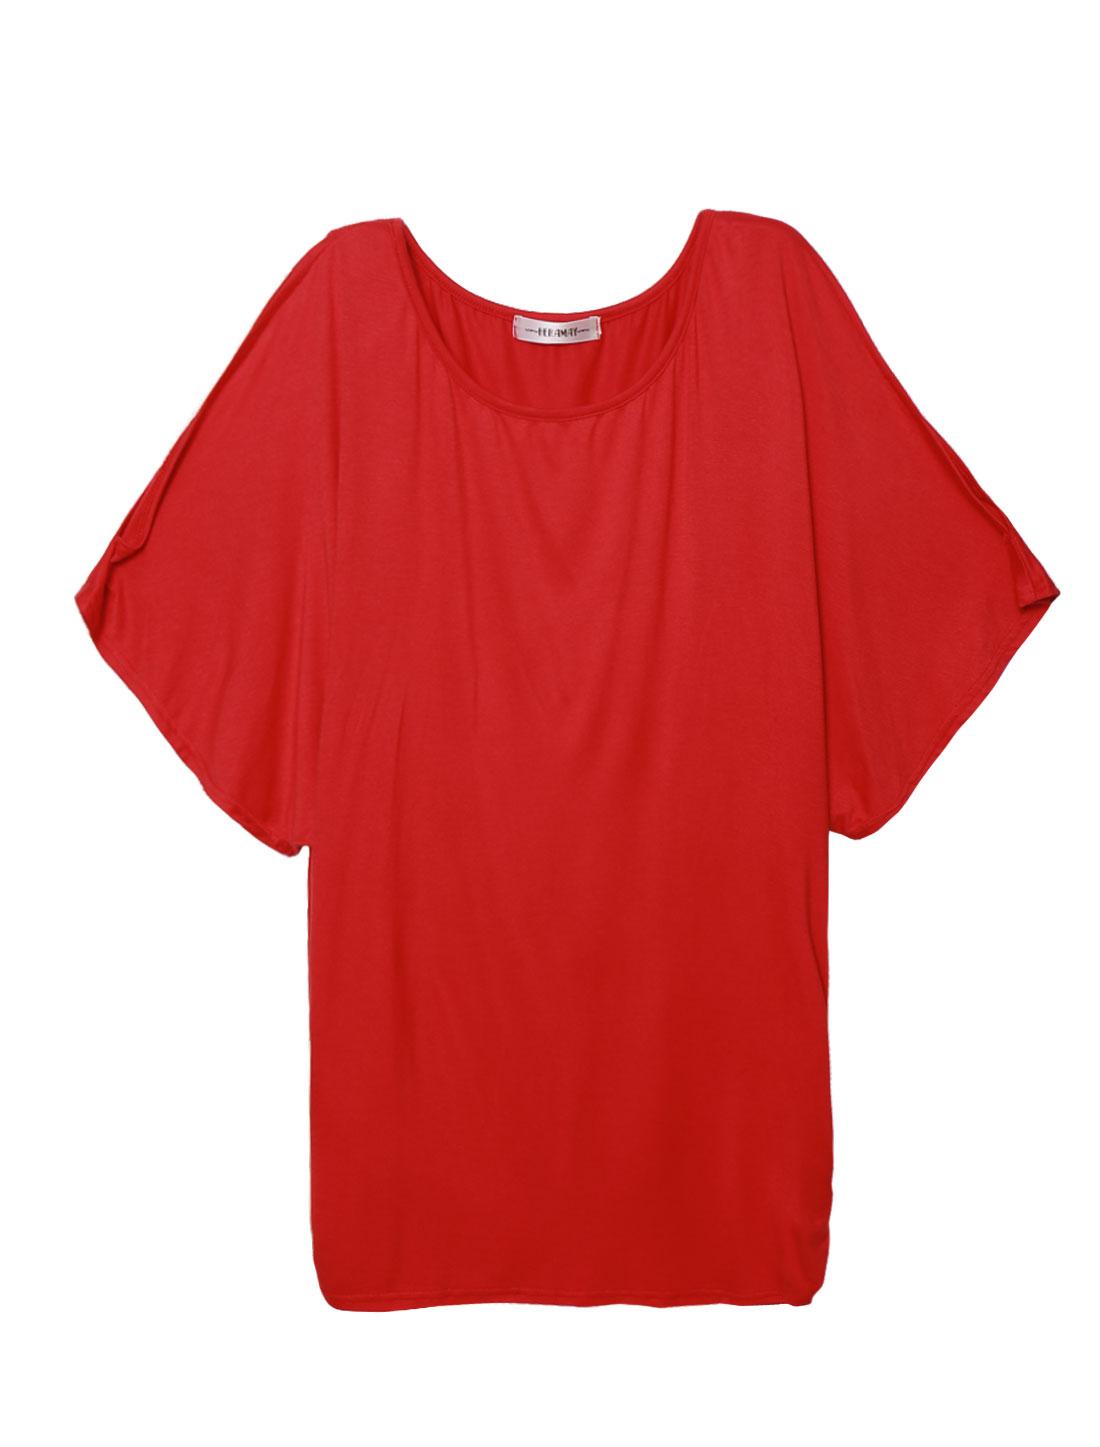 Women 3/4 Kimono Sleeves Round Neck Shirred Sides Tunic Top Red L